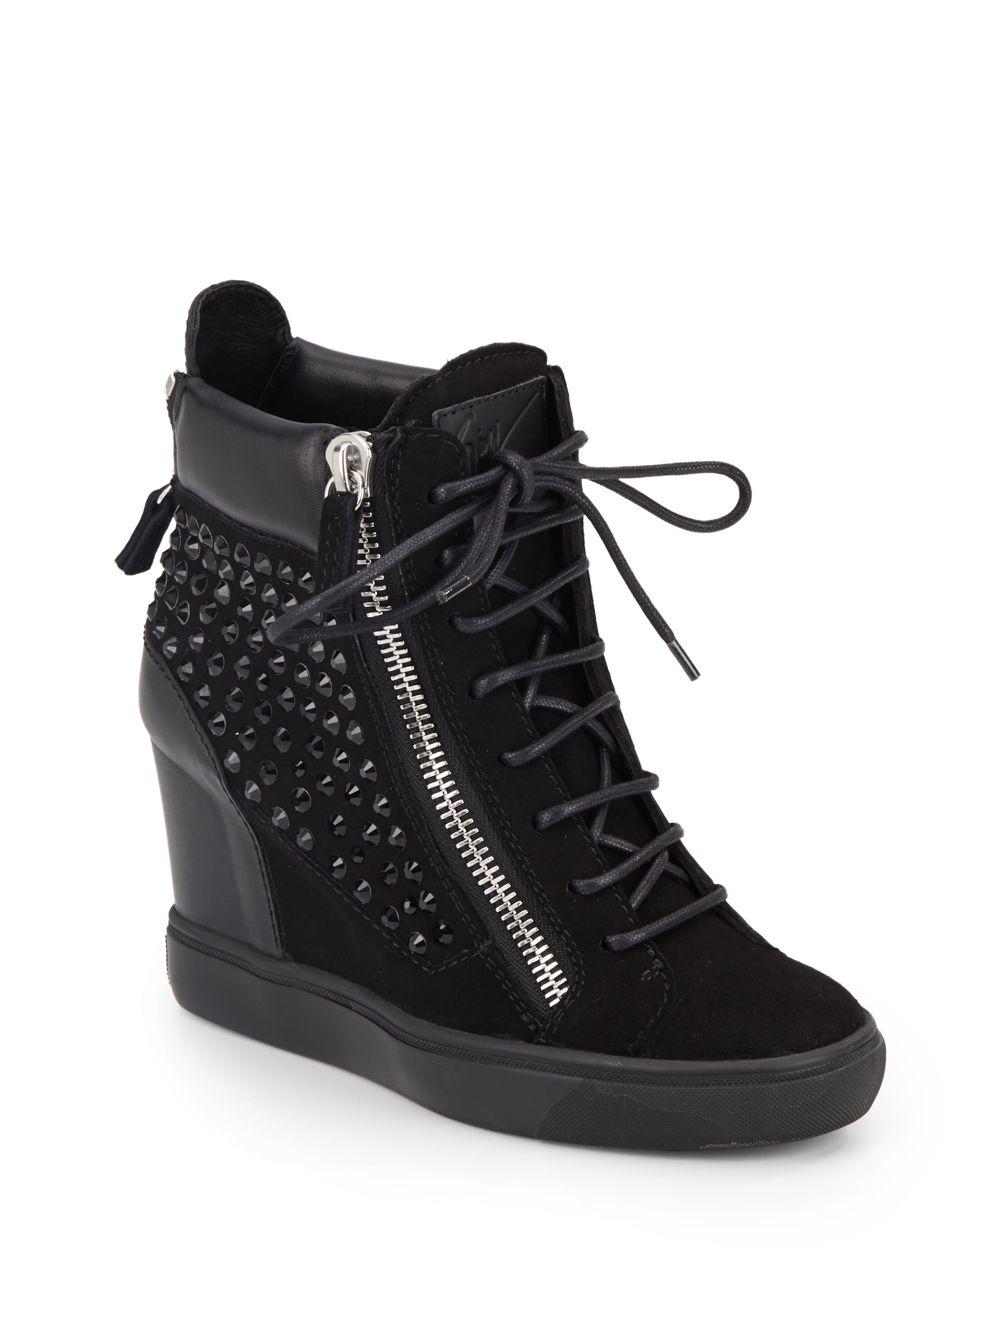 ba4a6507843 Lyst - Giuseppe Zanotti Crystal-studded Suede   Leather Wedge ...